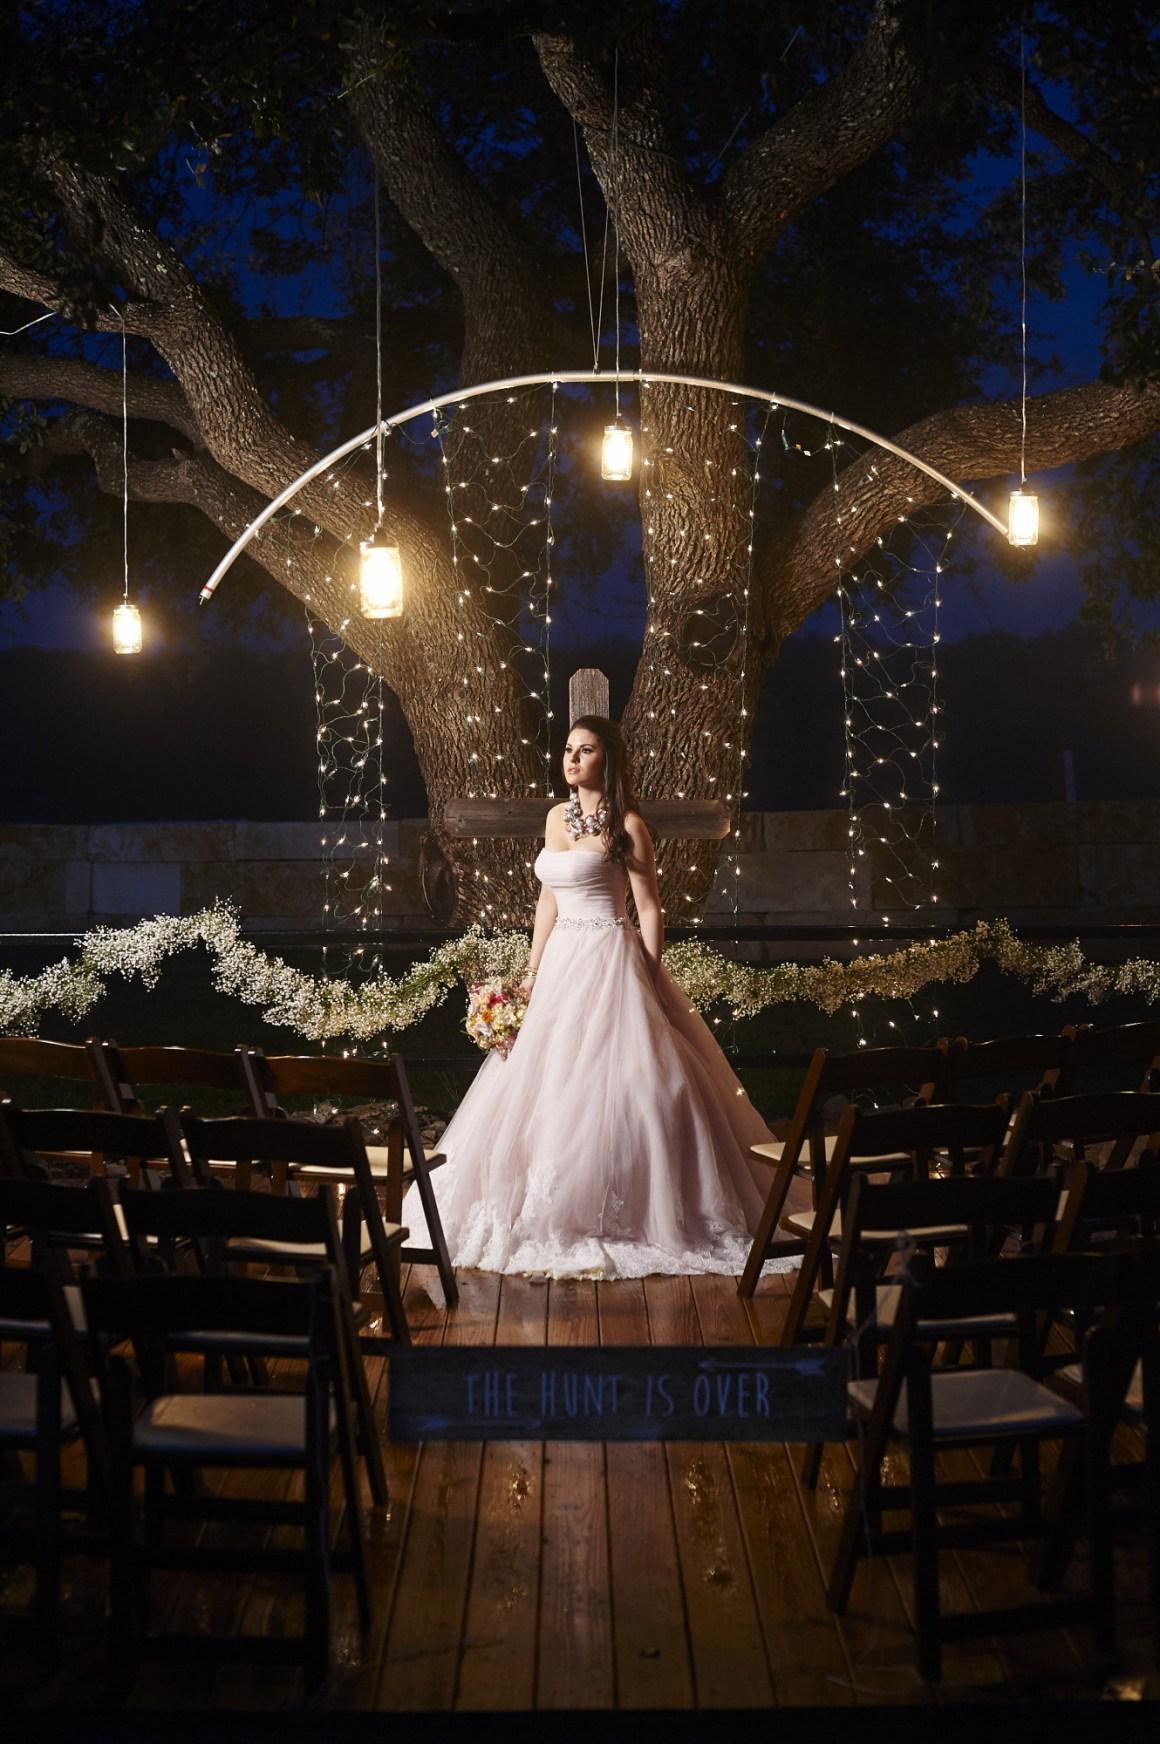 Epic Blue Hour Bridal Portrait - Texas Oak Tree Bridal Portrait - Blush Wedding Dress - Blue Hour Wedding Ceremony - Austin Wedding Photographer - Rustic Wedding